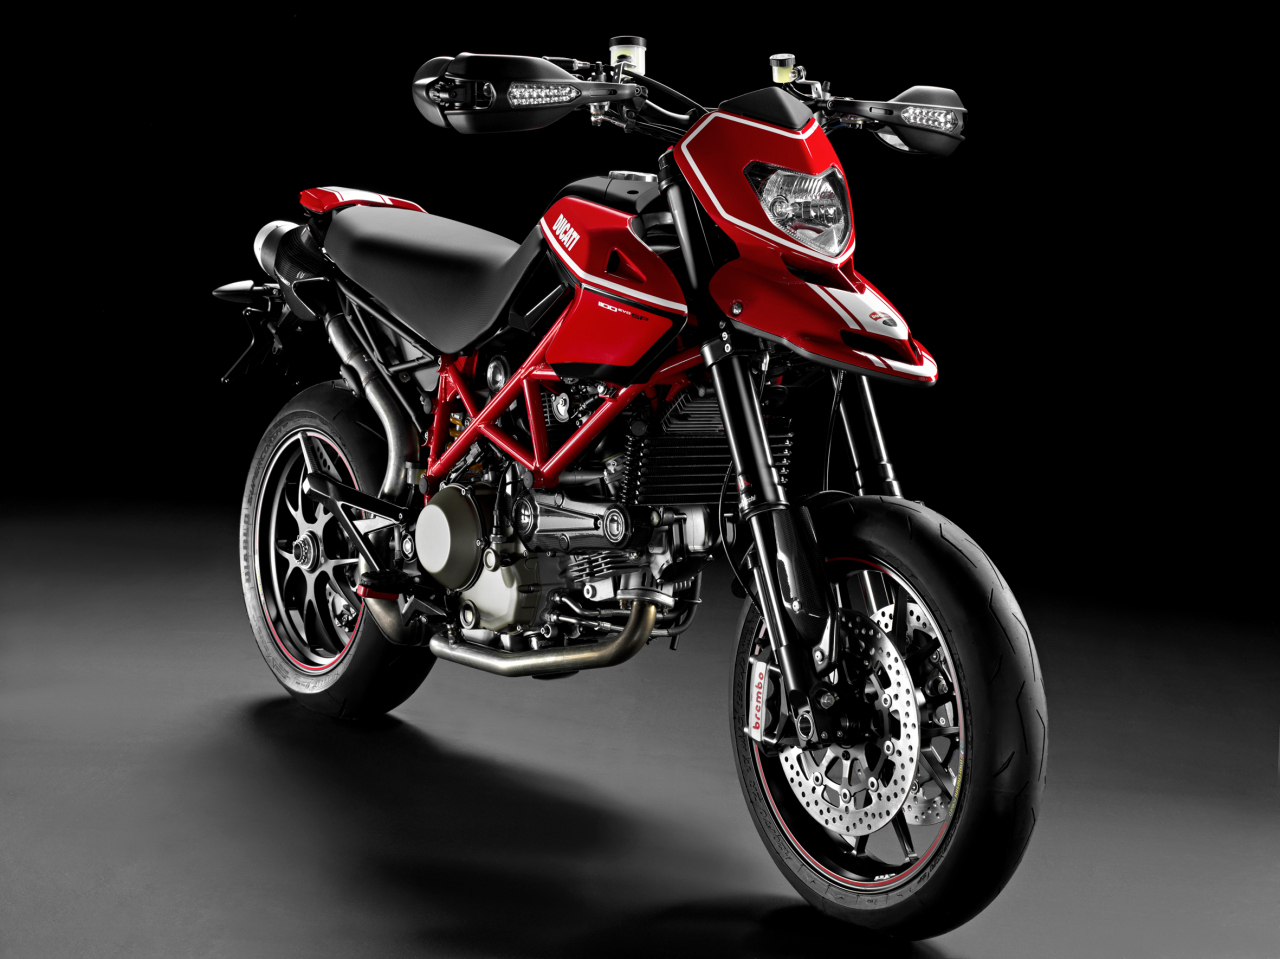 Ducati Supermoto Prices